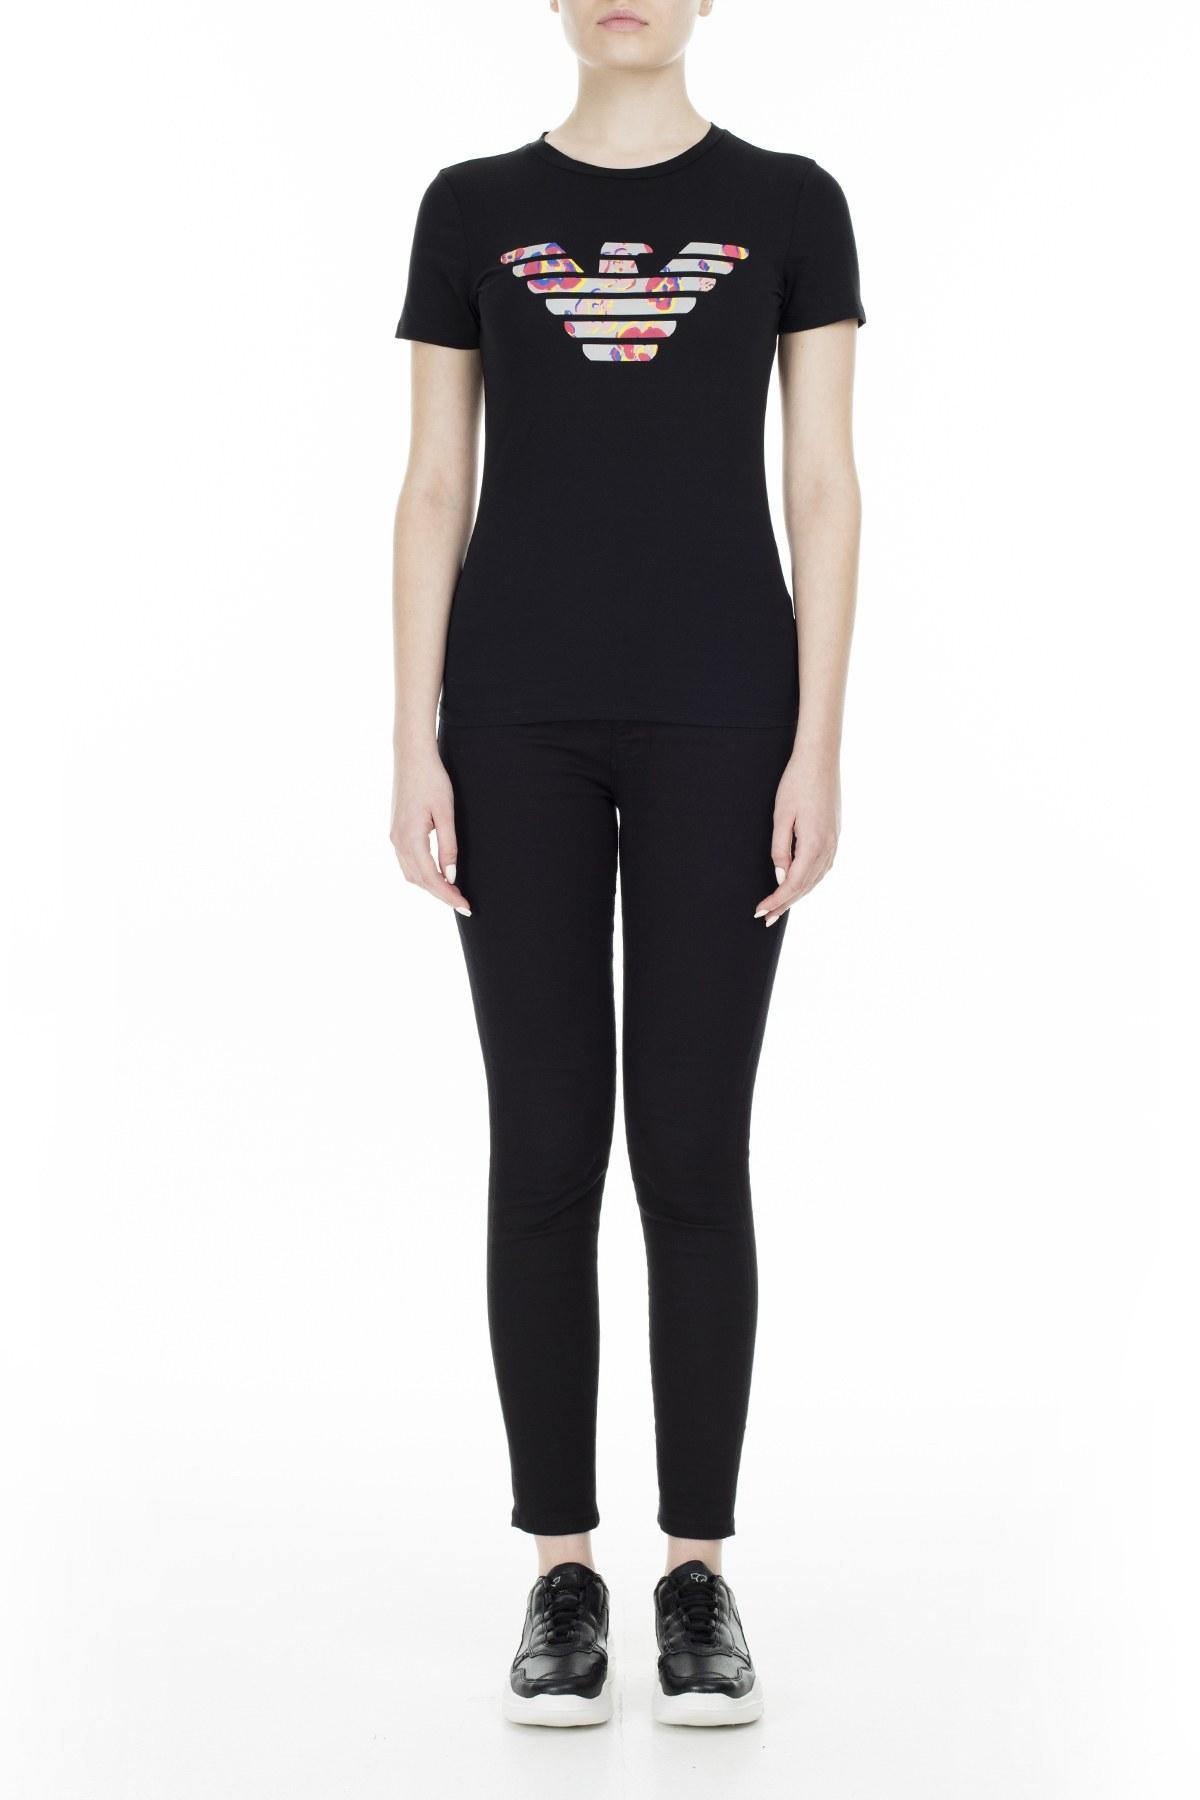 Emporio Armani Kadın T Shirt S 6G2T7N 2J07Z 0999 SİYAH